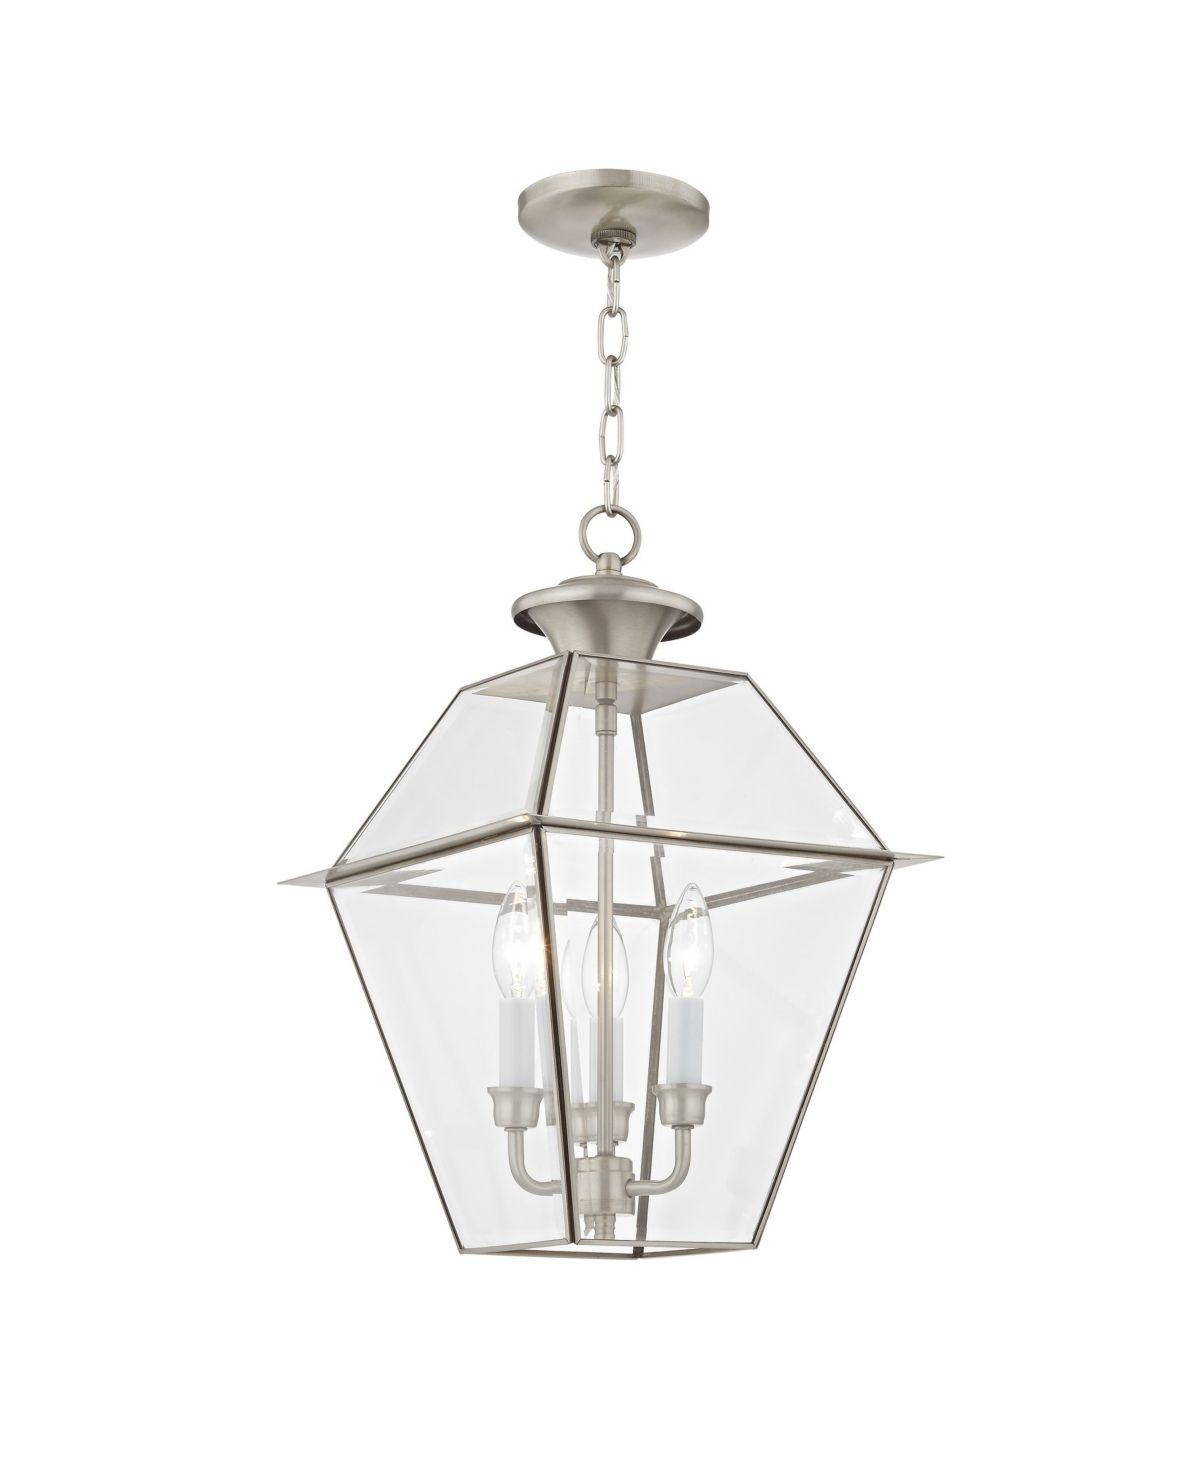 Livex Westover 3 Light Outdoor Chain Lantern Reviews Home Macy S Livex Lighting Outdoor Pendant Lighting Outdoor Hanging Lights